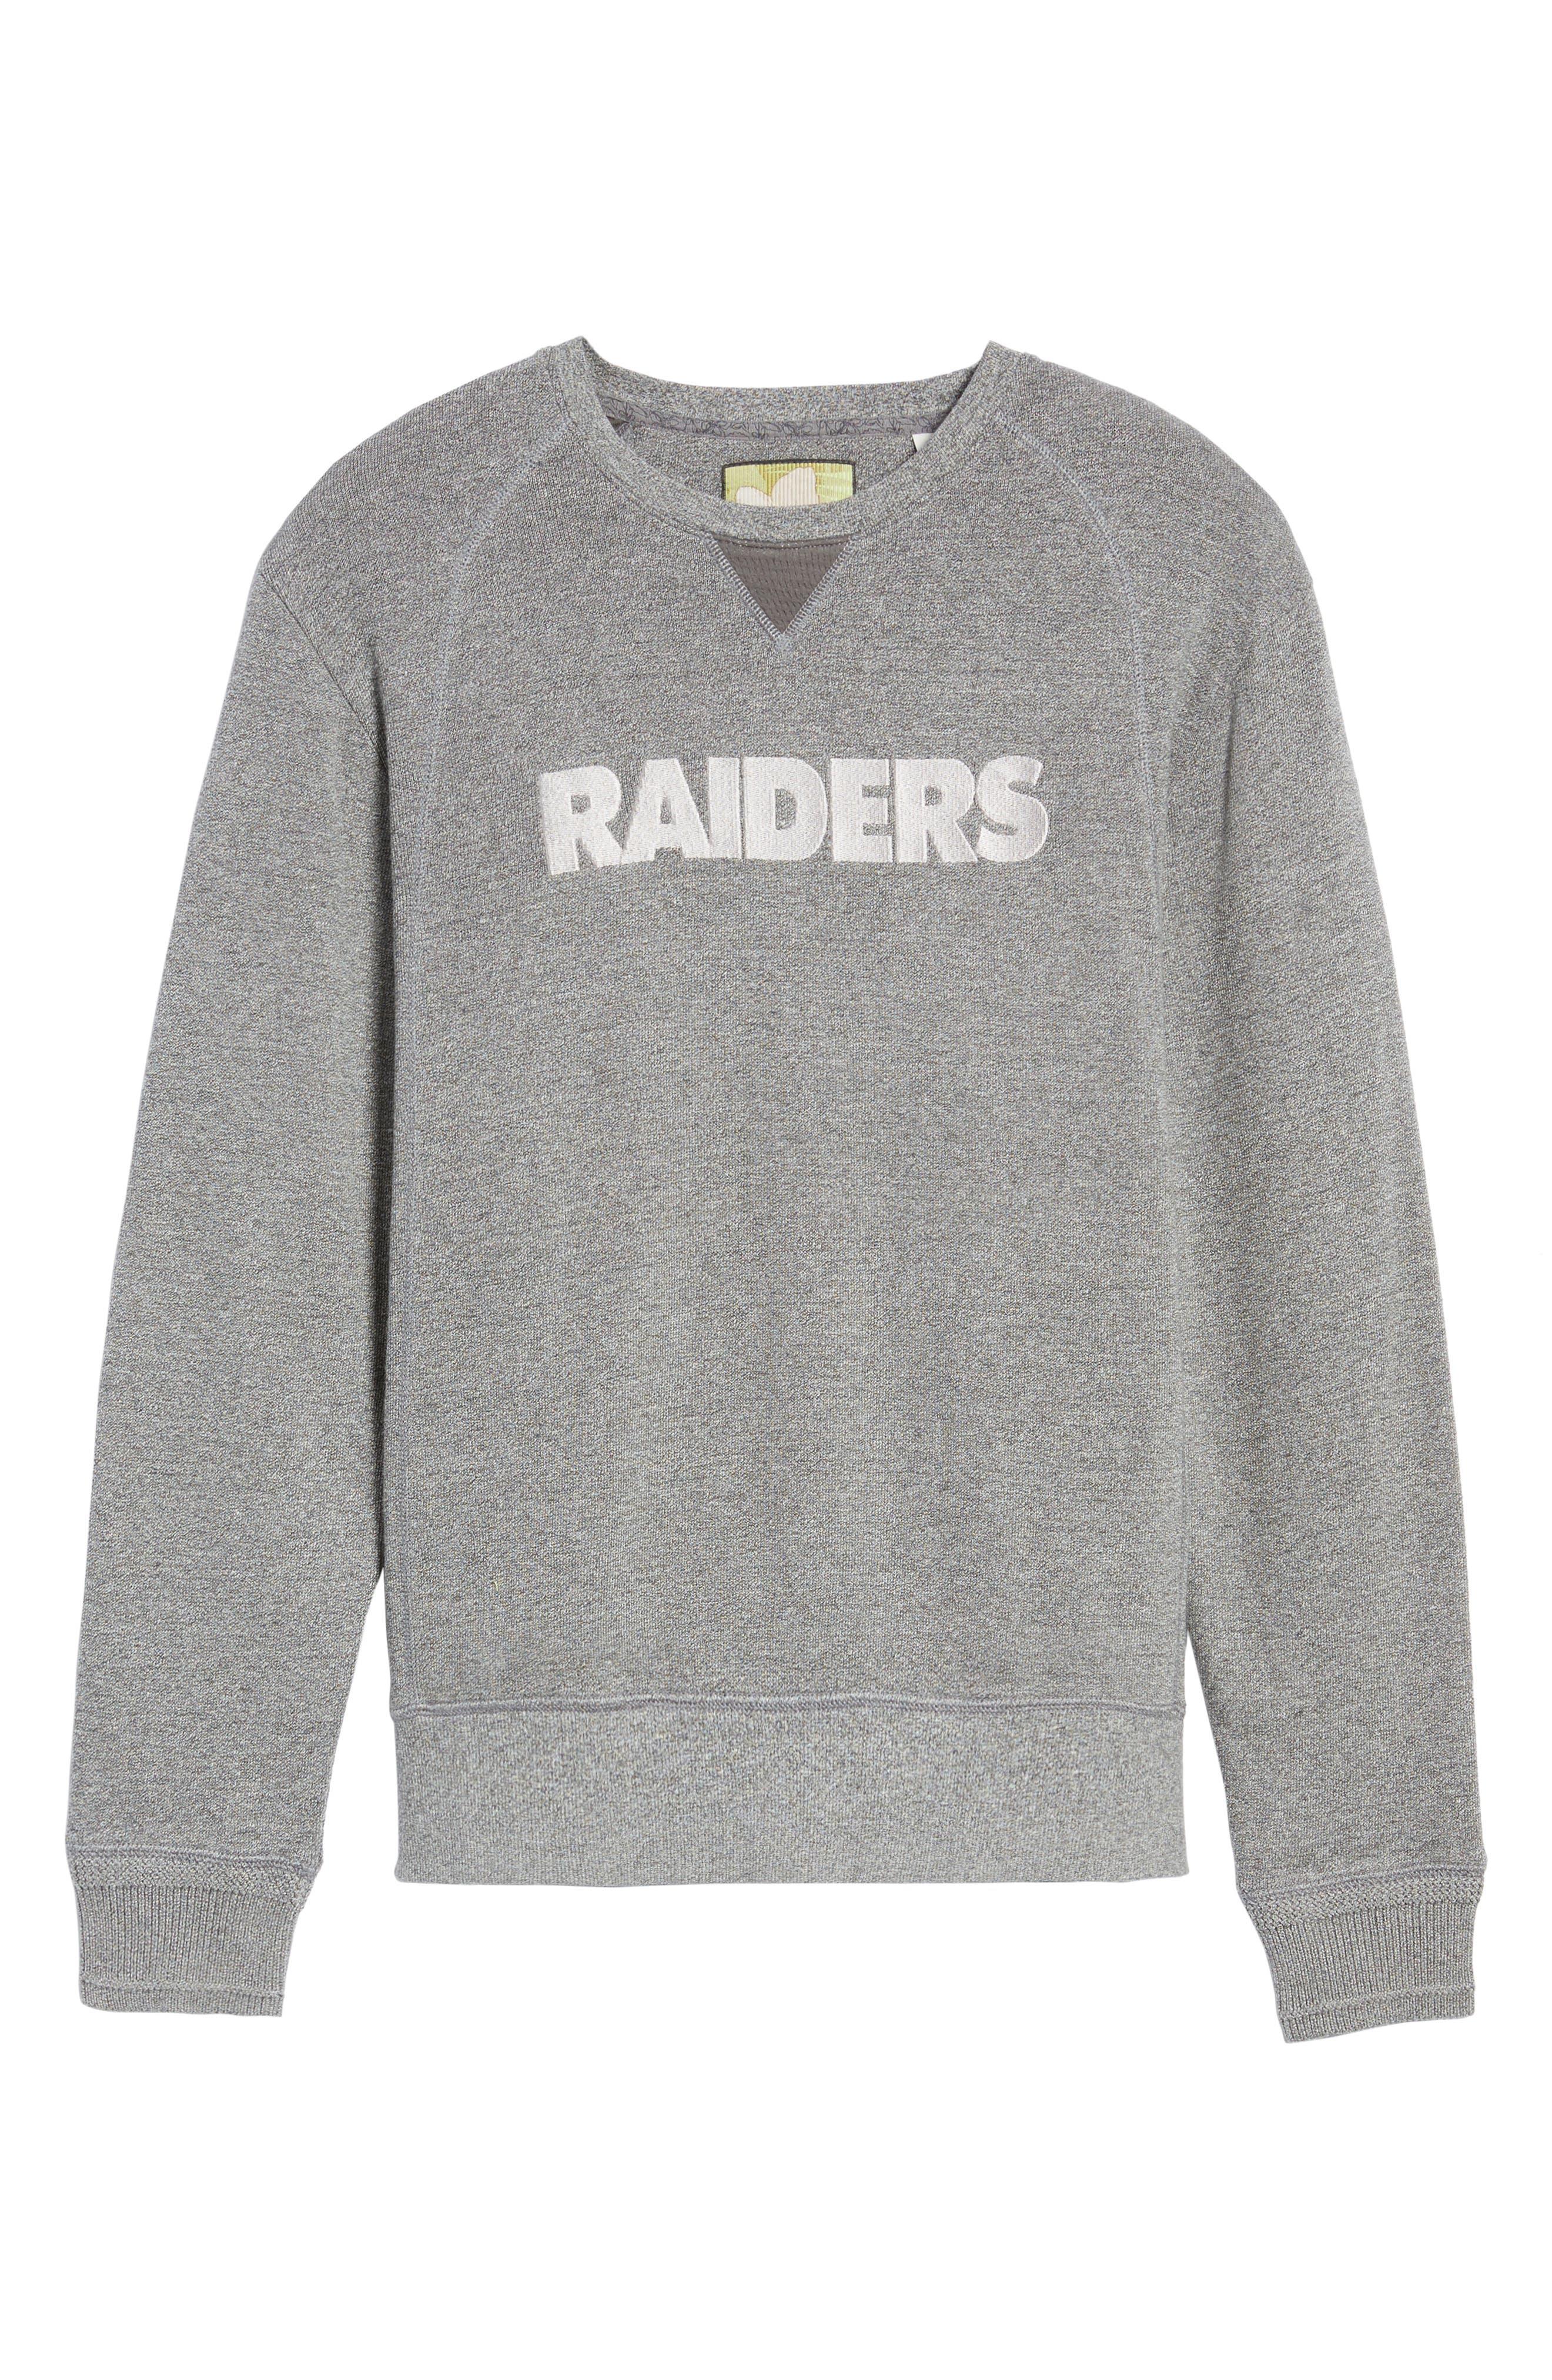 NFL Stitch of Liberty Embroidered Crewneck Sweatshirt,                             Alternate thumbnail 175, color,